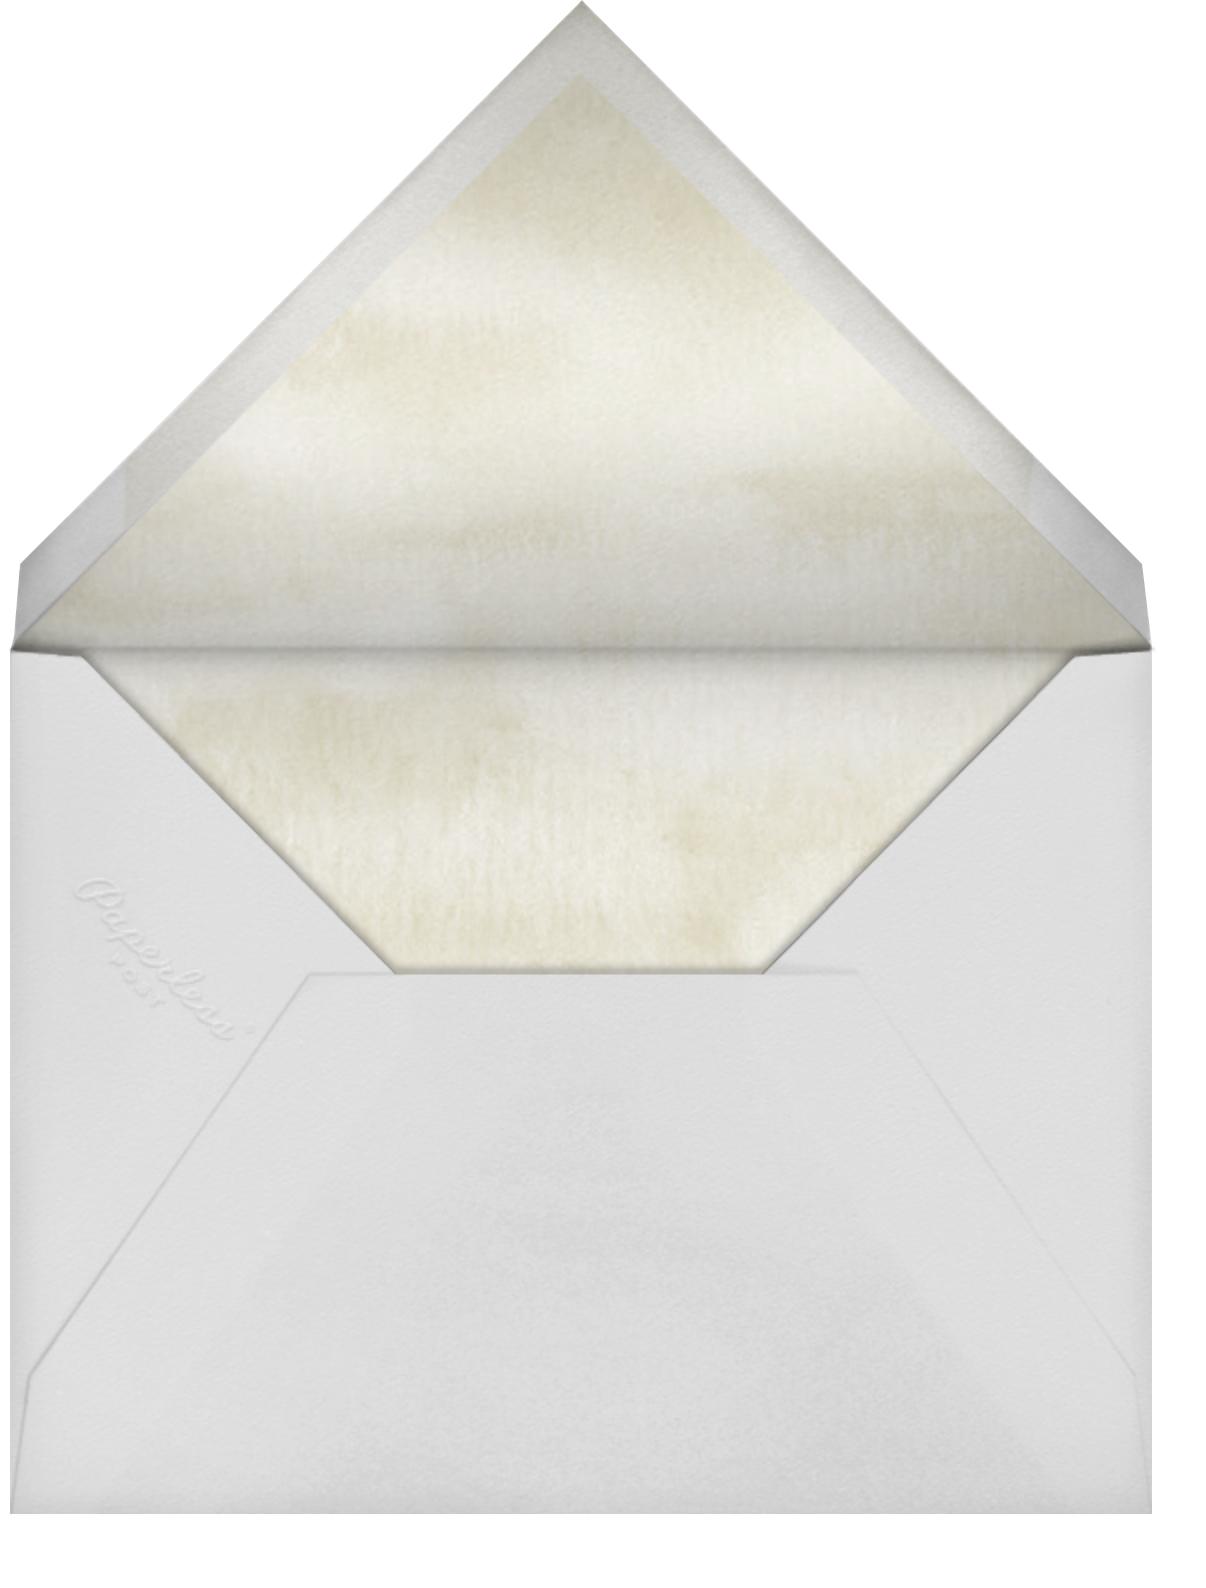 Muguet - Felix Doolittle - Baby shower - envelope back